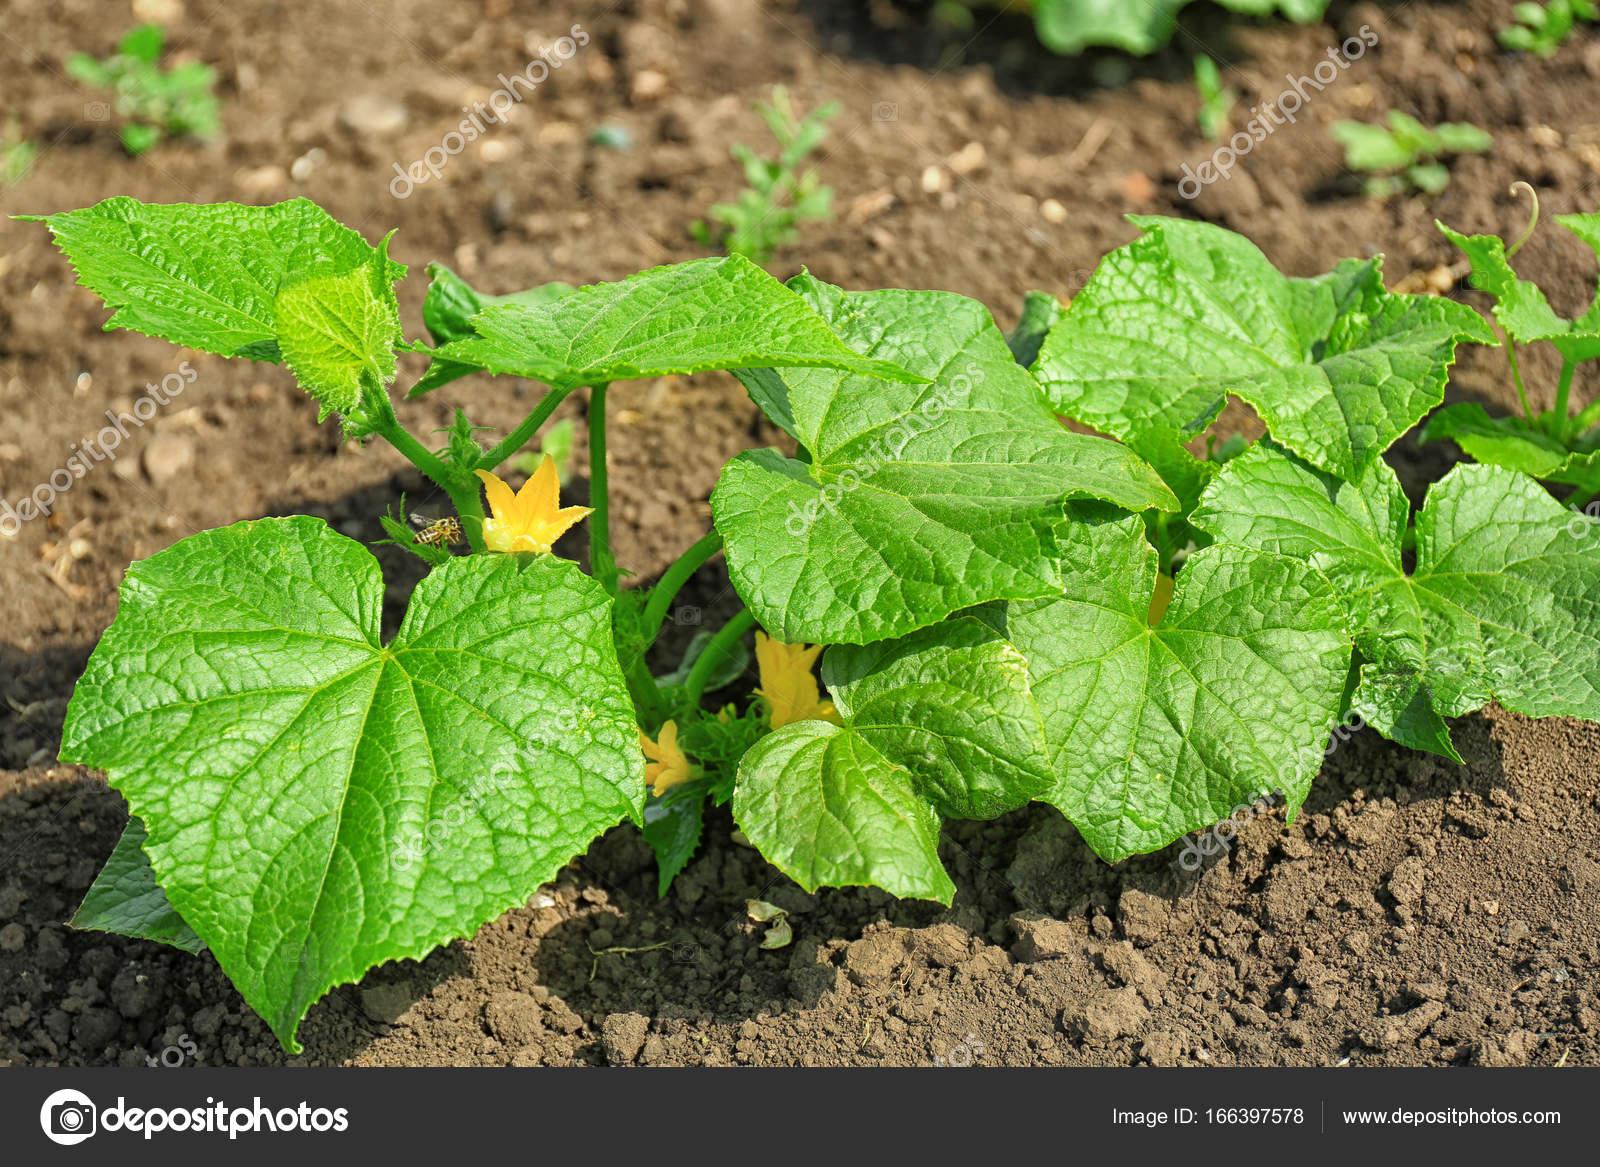 Grune Kurbis Pflanze Wachst Im Garten Stockfoto C Belchonock